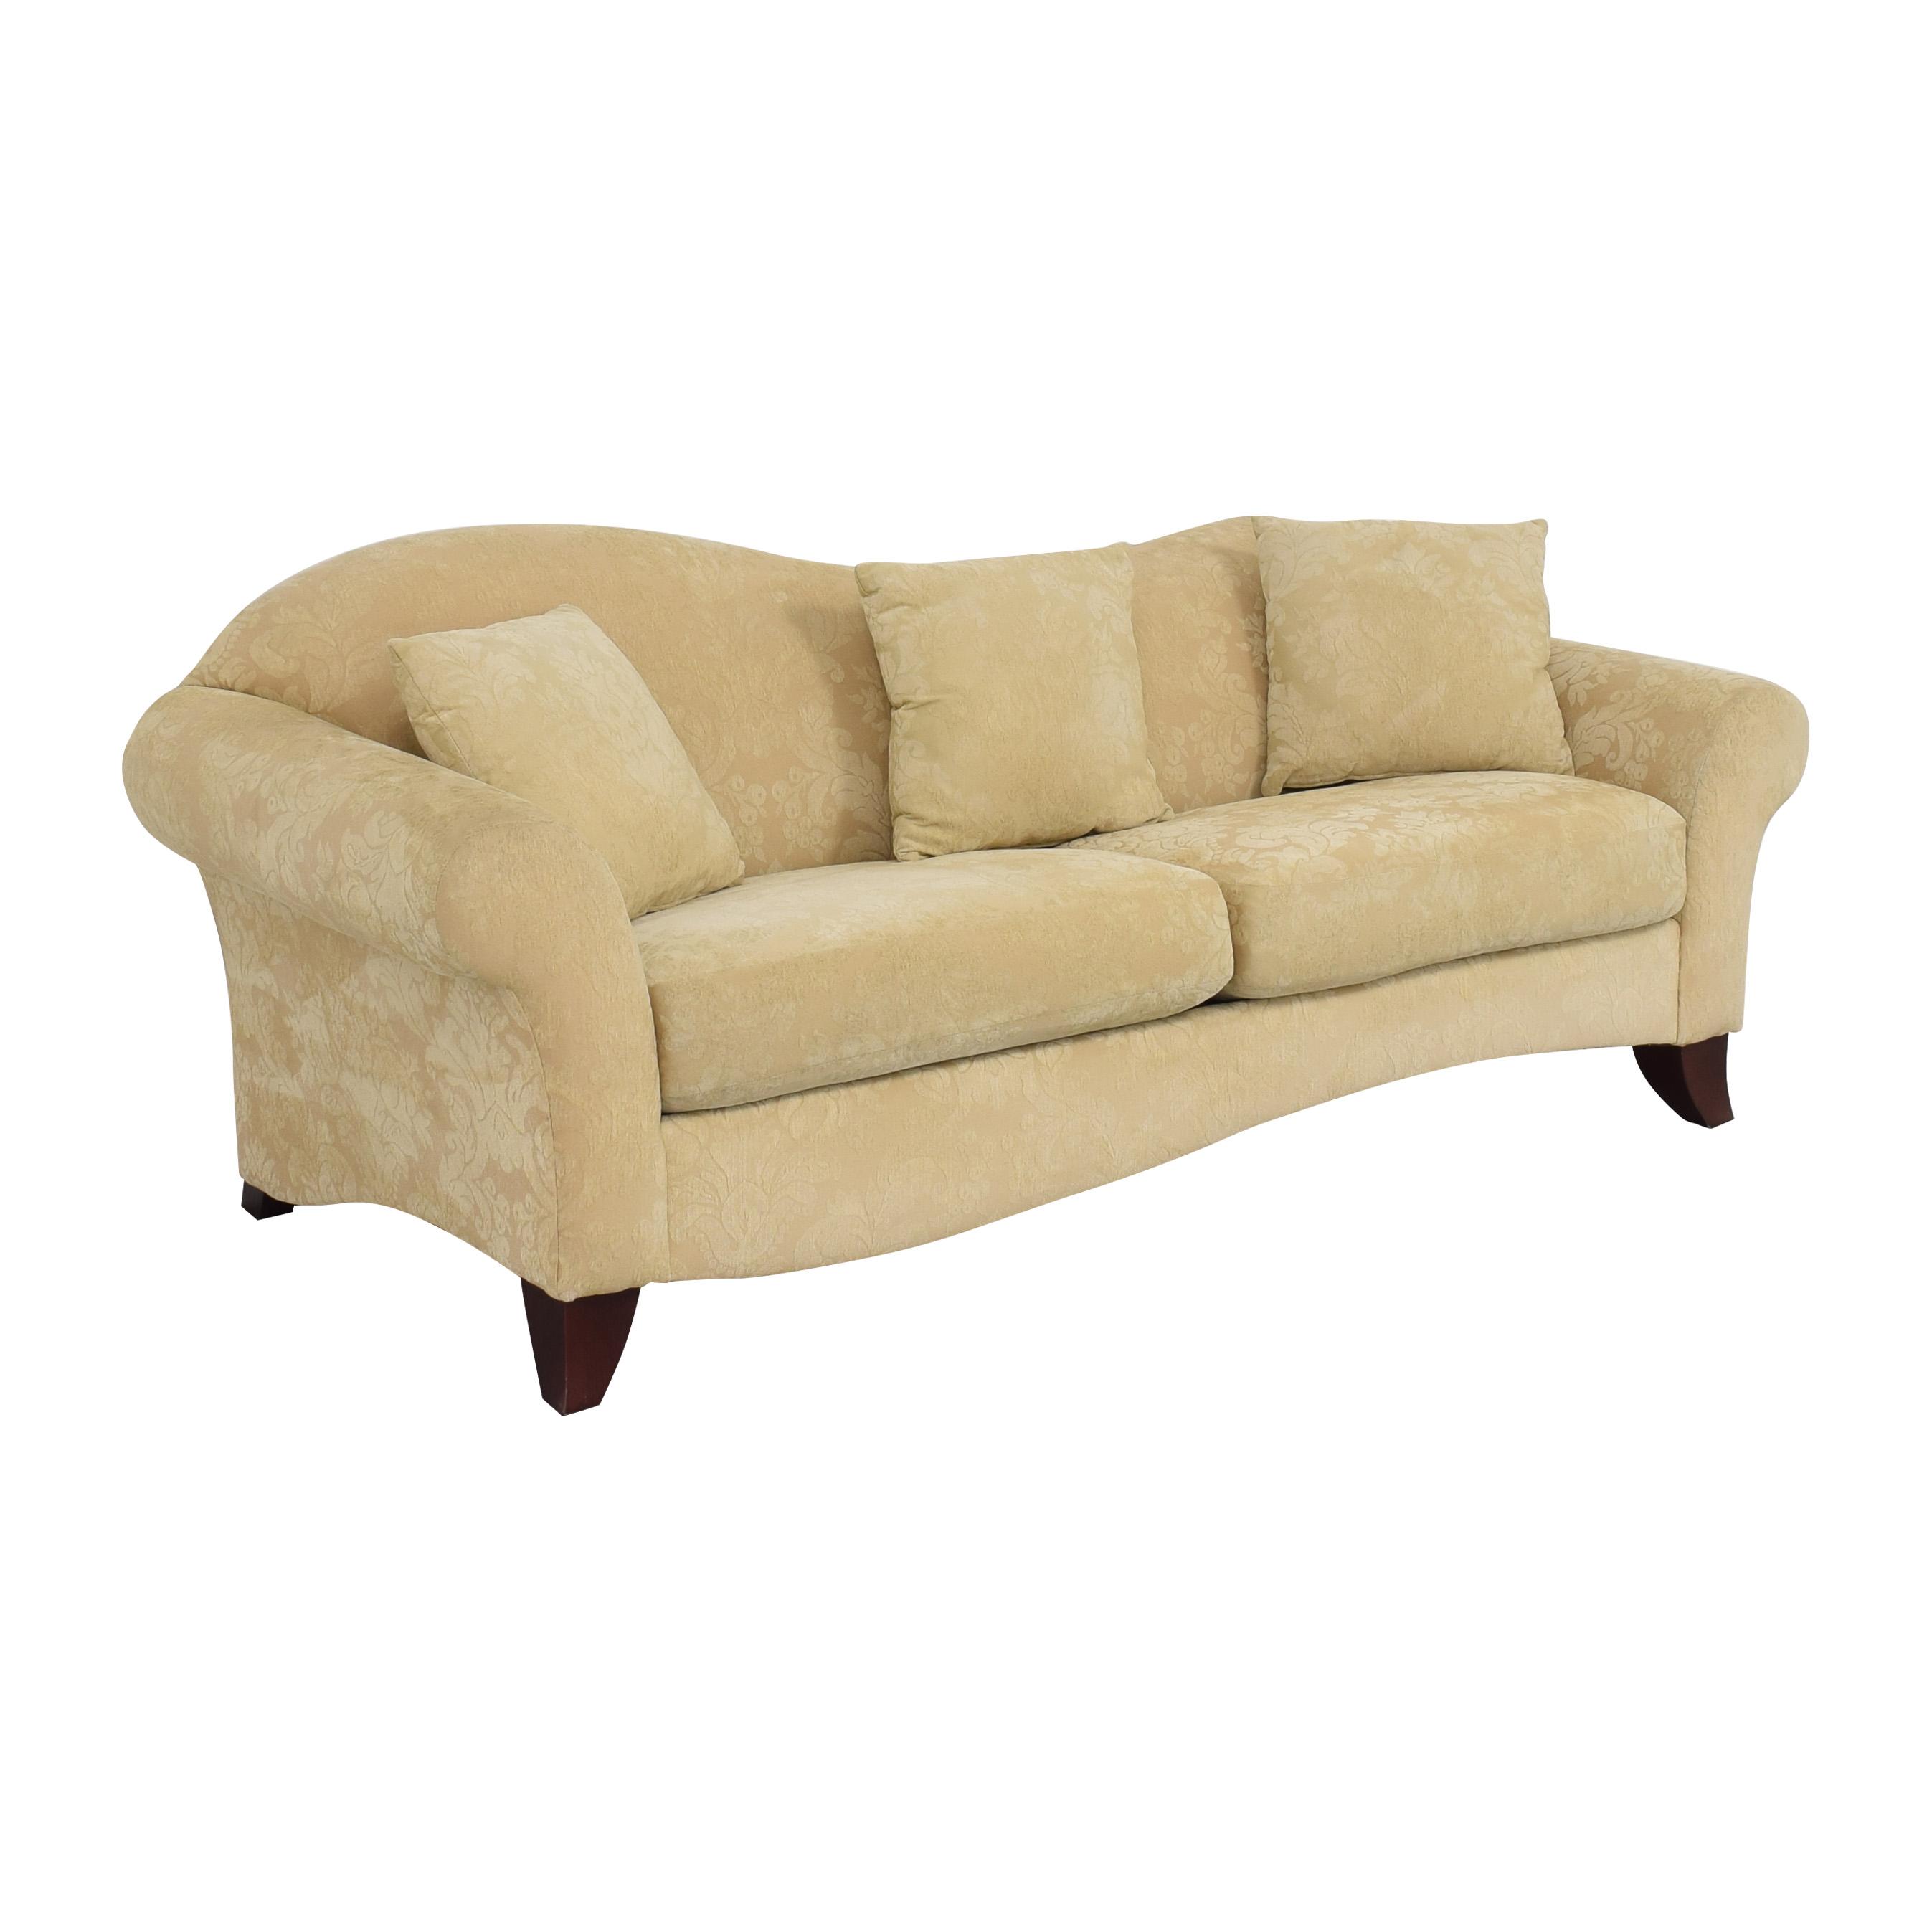 buy Macy's Macy's Two Cushion Sofa online